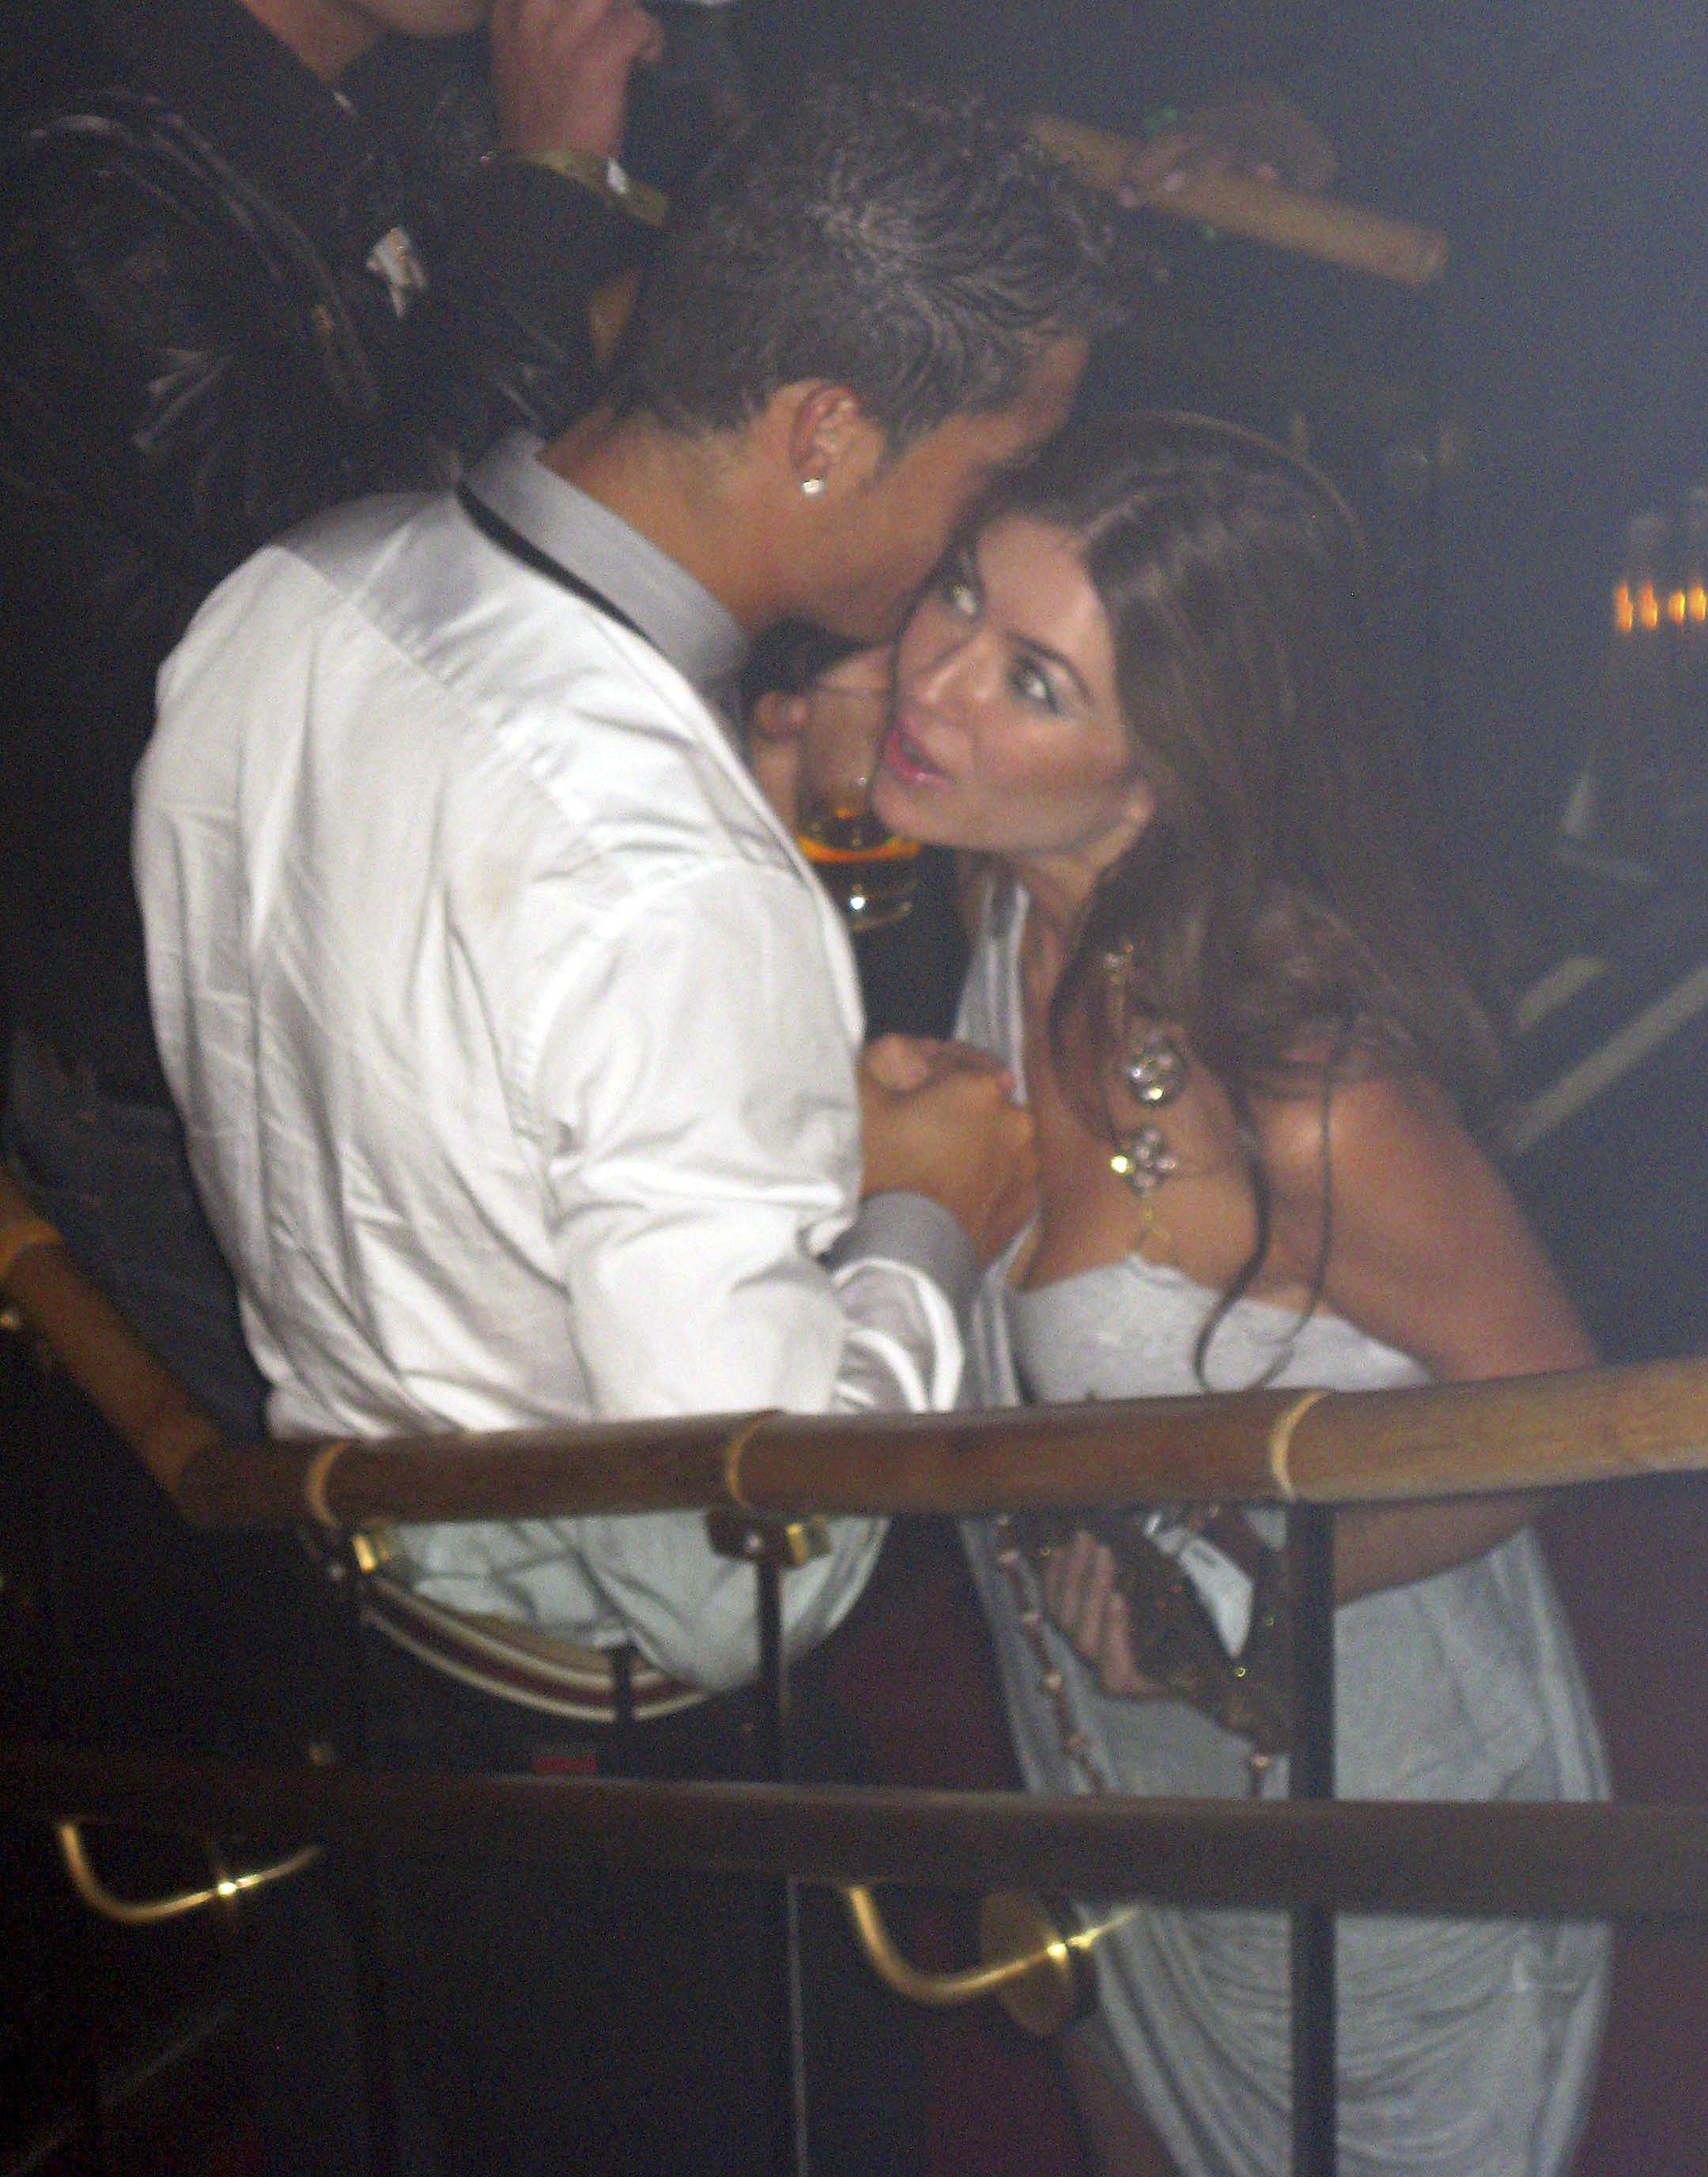 Ronaldo was snapped with rape accuser Kathryn Mayorga in the Rain nightclub Las Vegas in June 2009